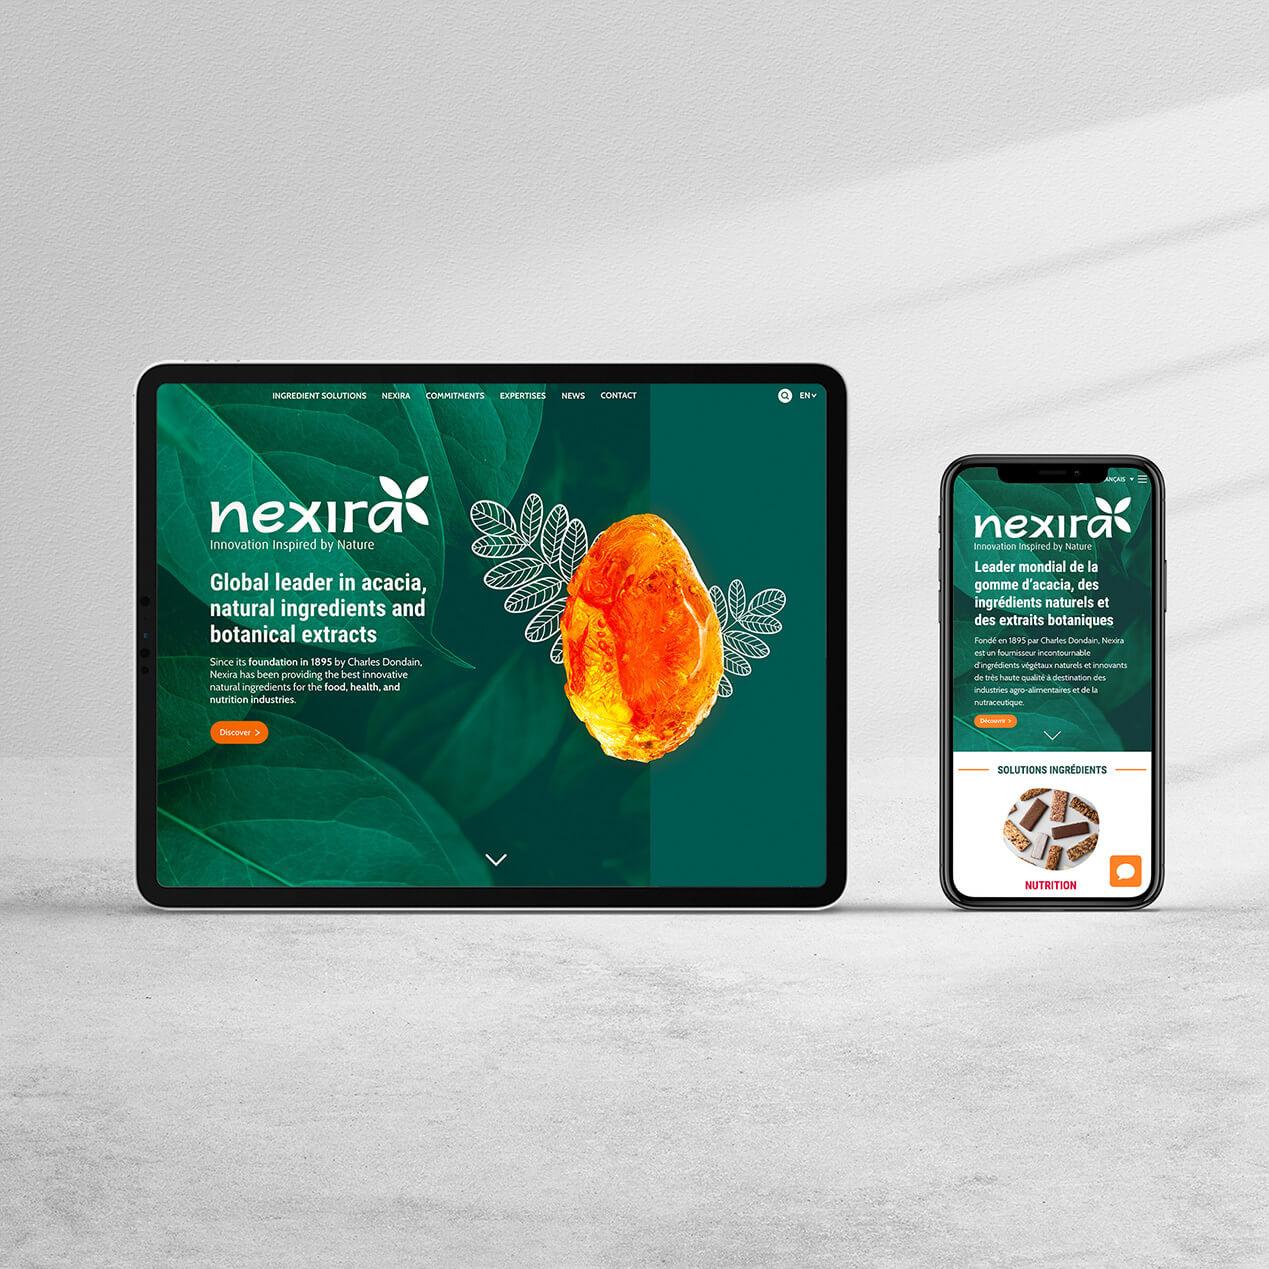 Nexira stratégie marketing et digitale